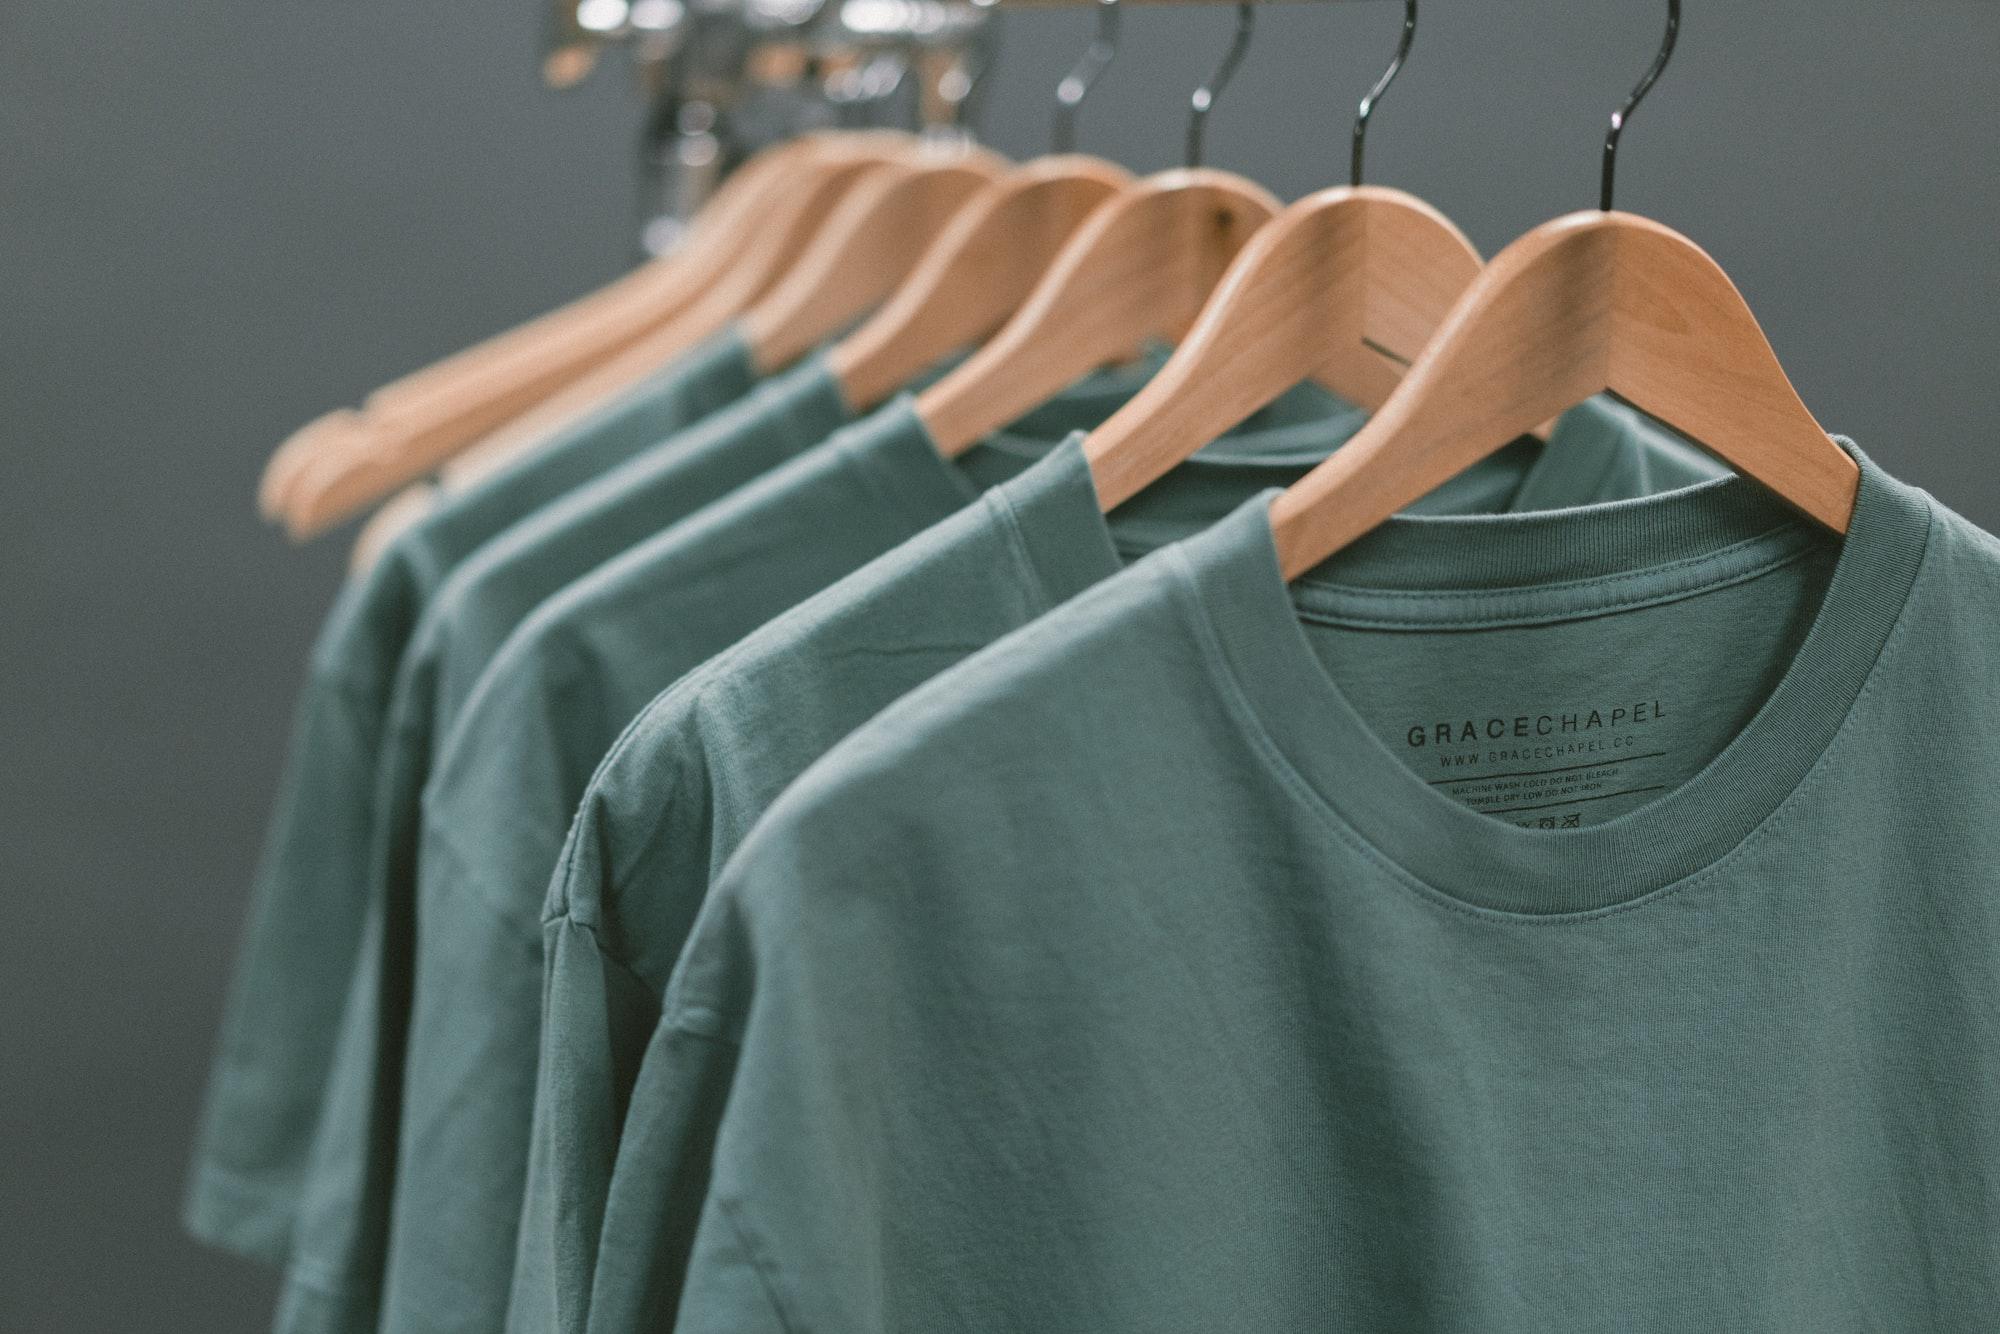 Metrics, T-shirts and Quality Engineering